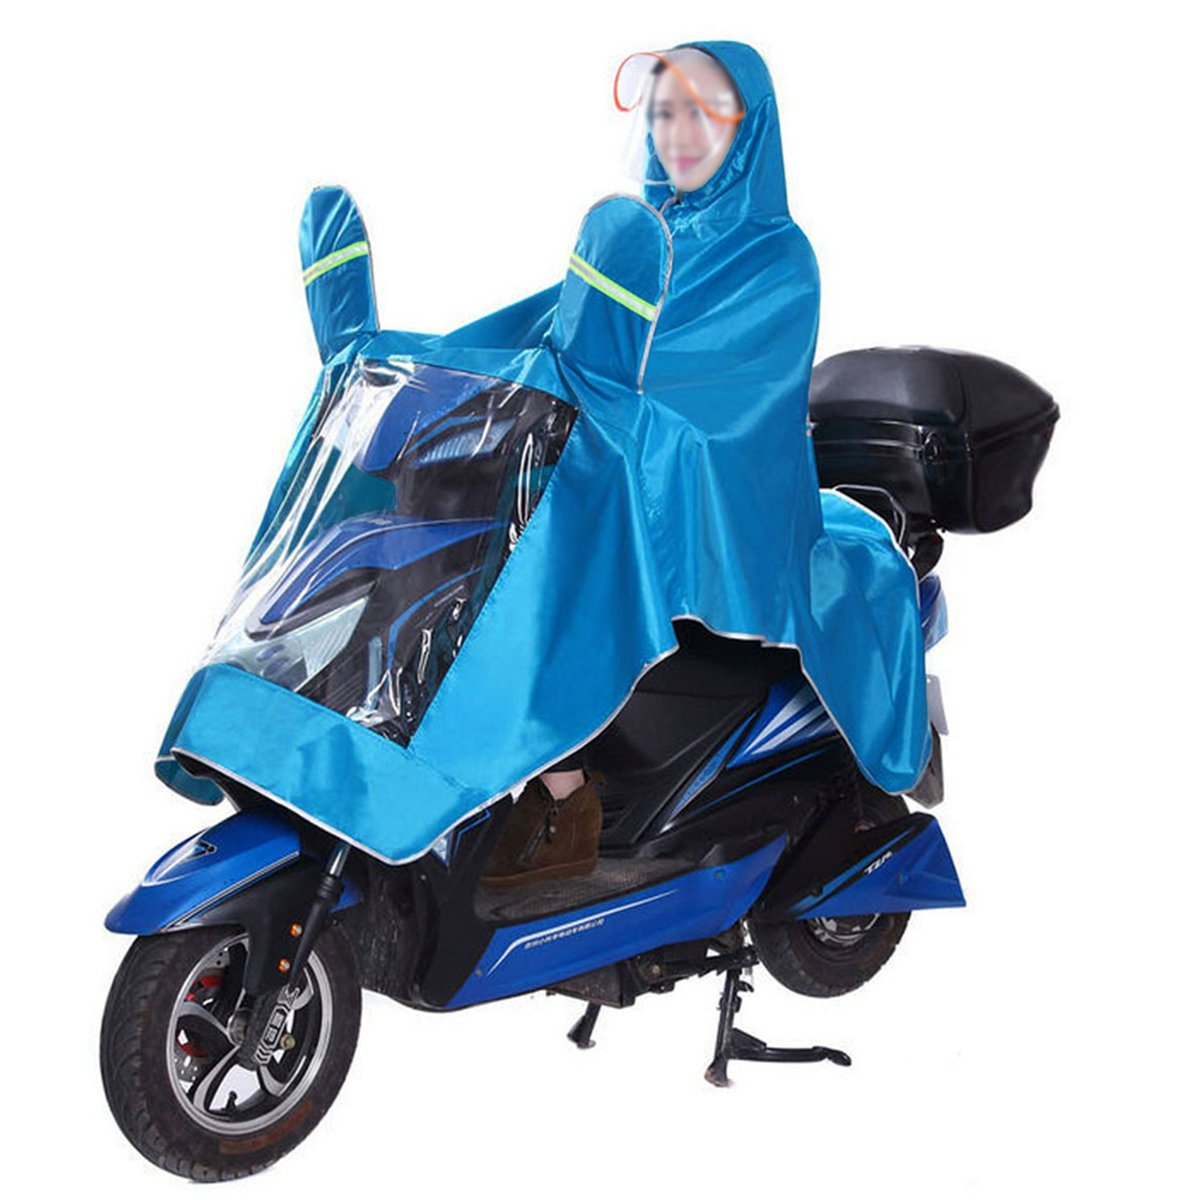 Millya Waterproof Portable Women Dry Hooded Raincoat Cute Polka Dot Rainwear for Bike Bicycle Motorbike Motorcycle XXXXL yy-02178-01C